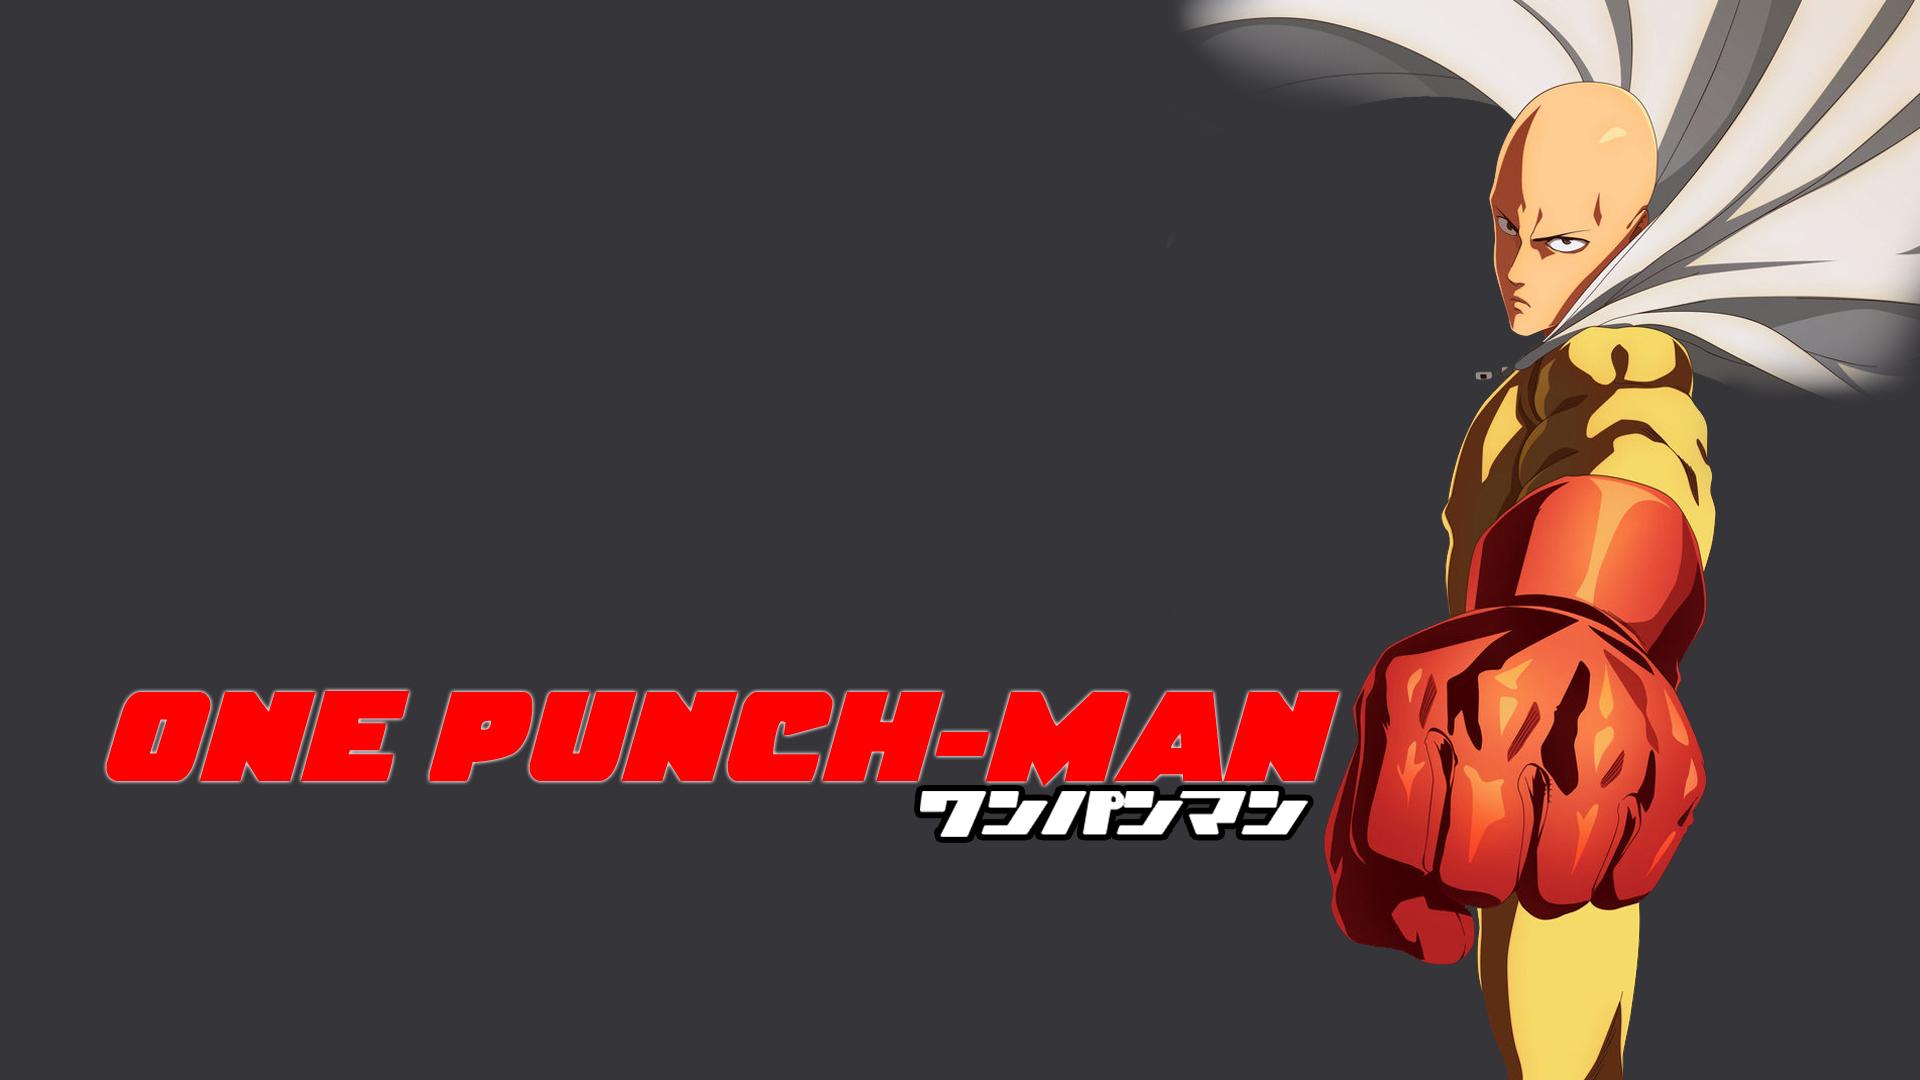 One Punch Man Wallpaper 1920x1080 - WallpaperSafari